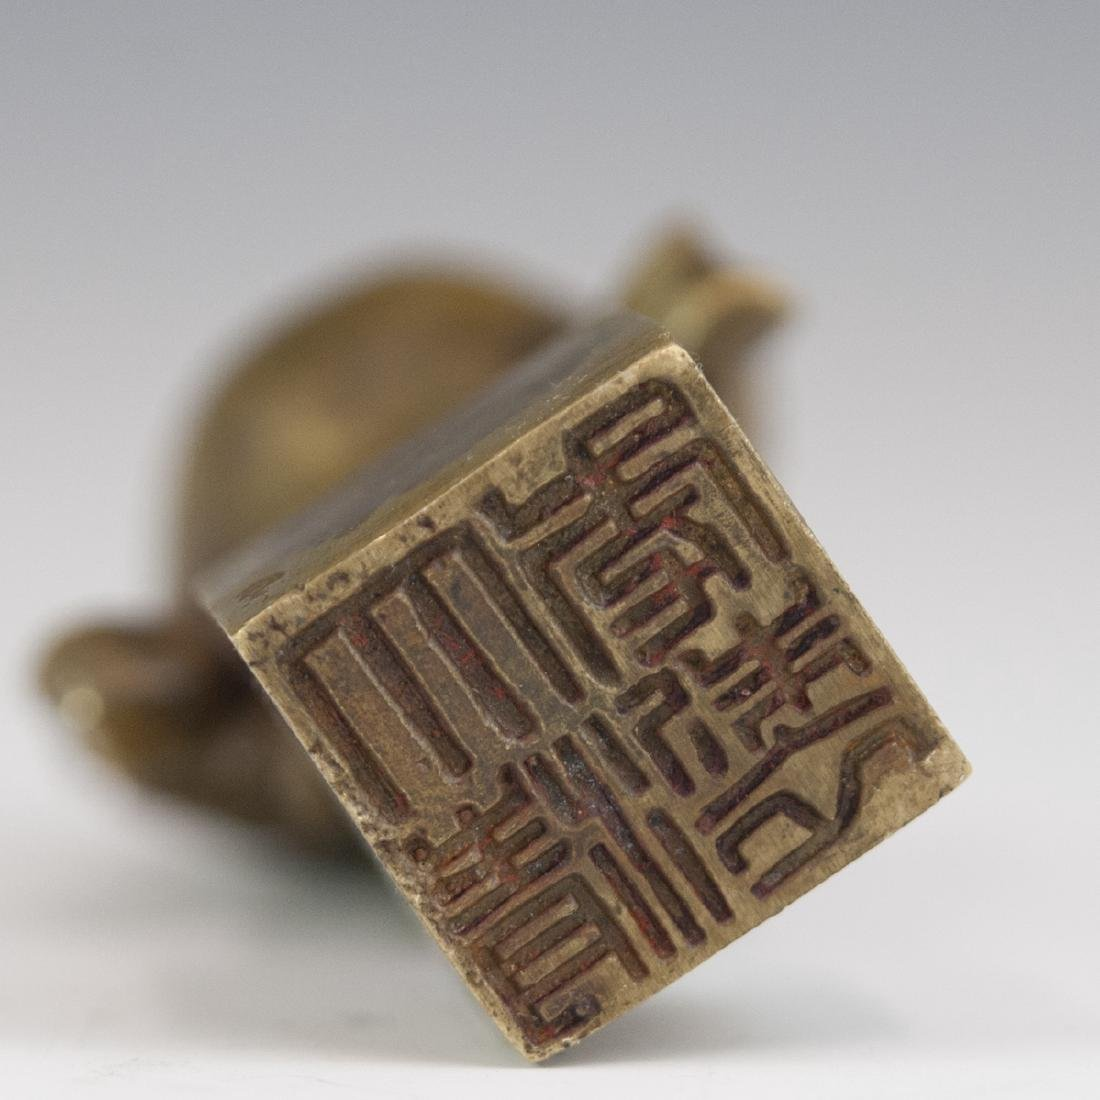 Tibetan Bronze Bodhisattva Wax Seal - 3